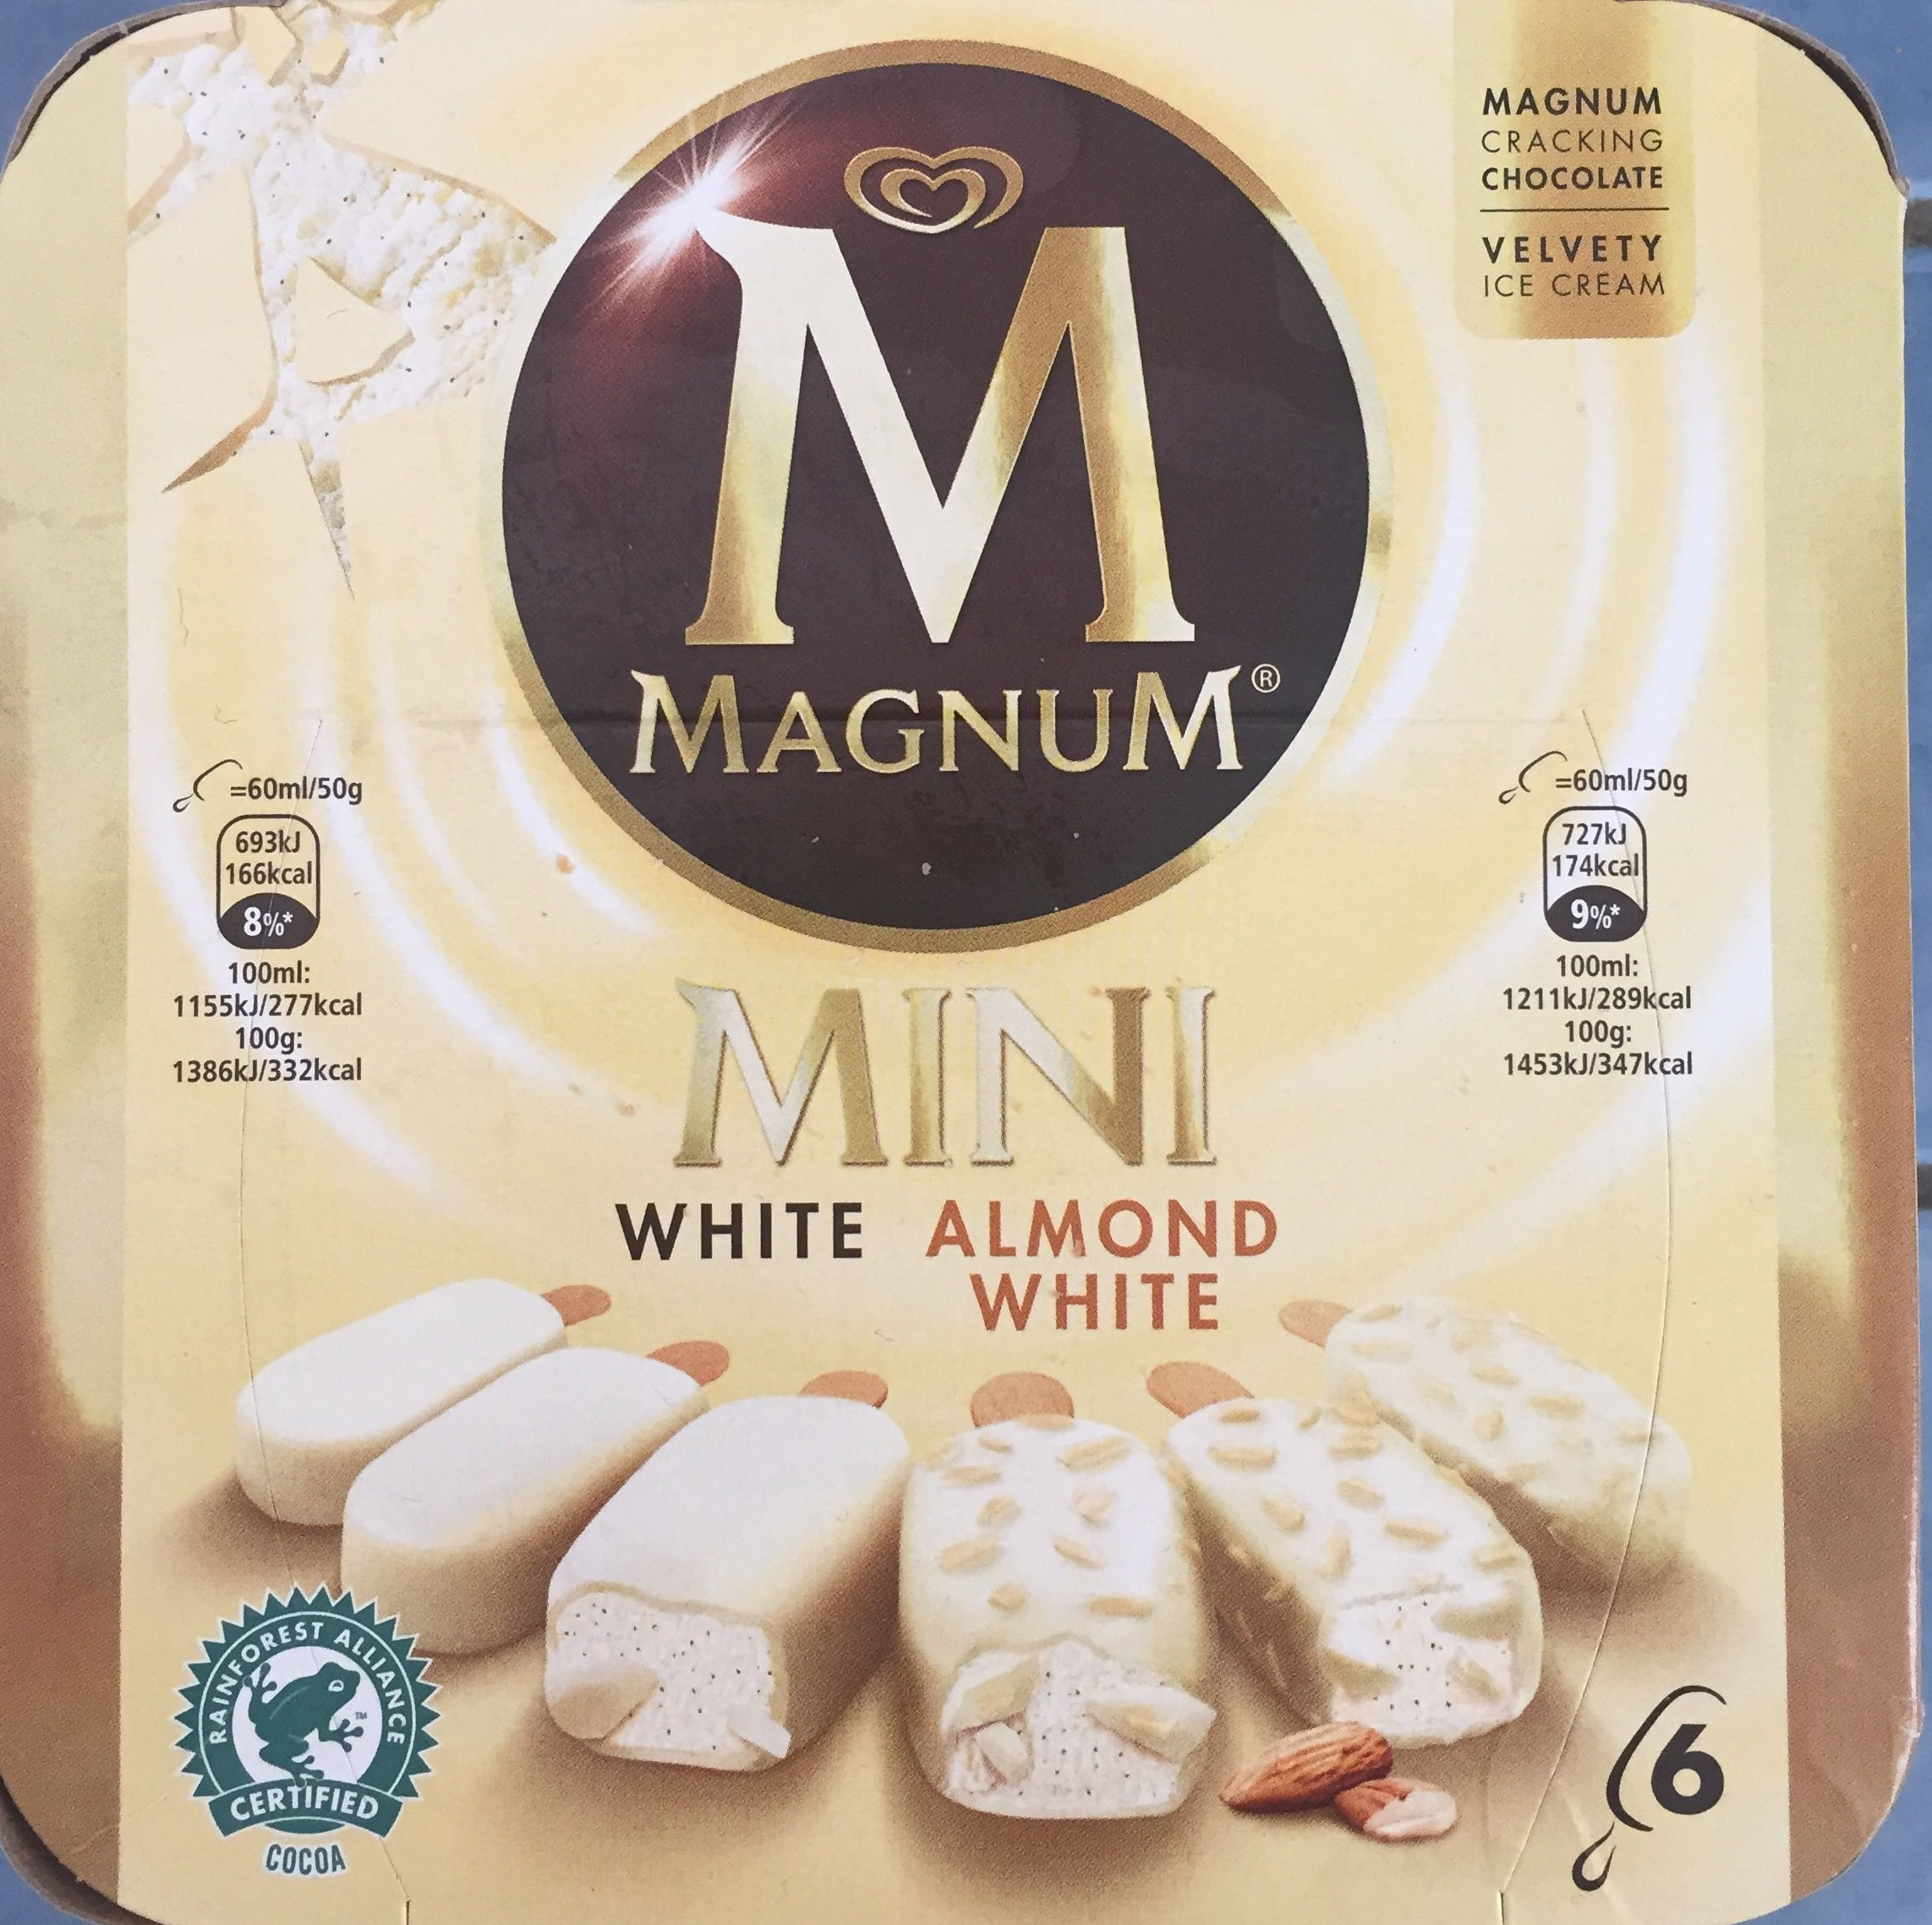 Magnum Mini Batonnet Glace Chocolat Blanc Amande x6 360ml - Produit - fr